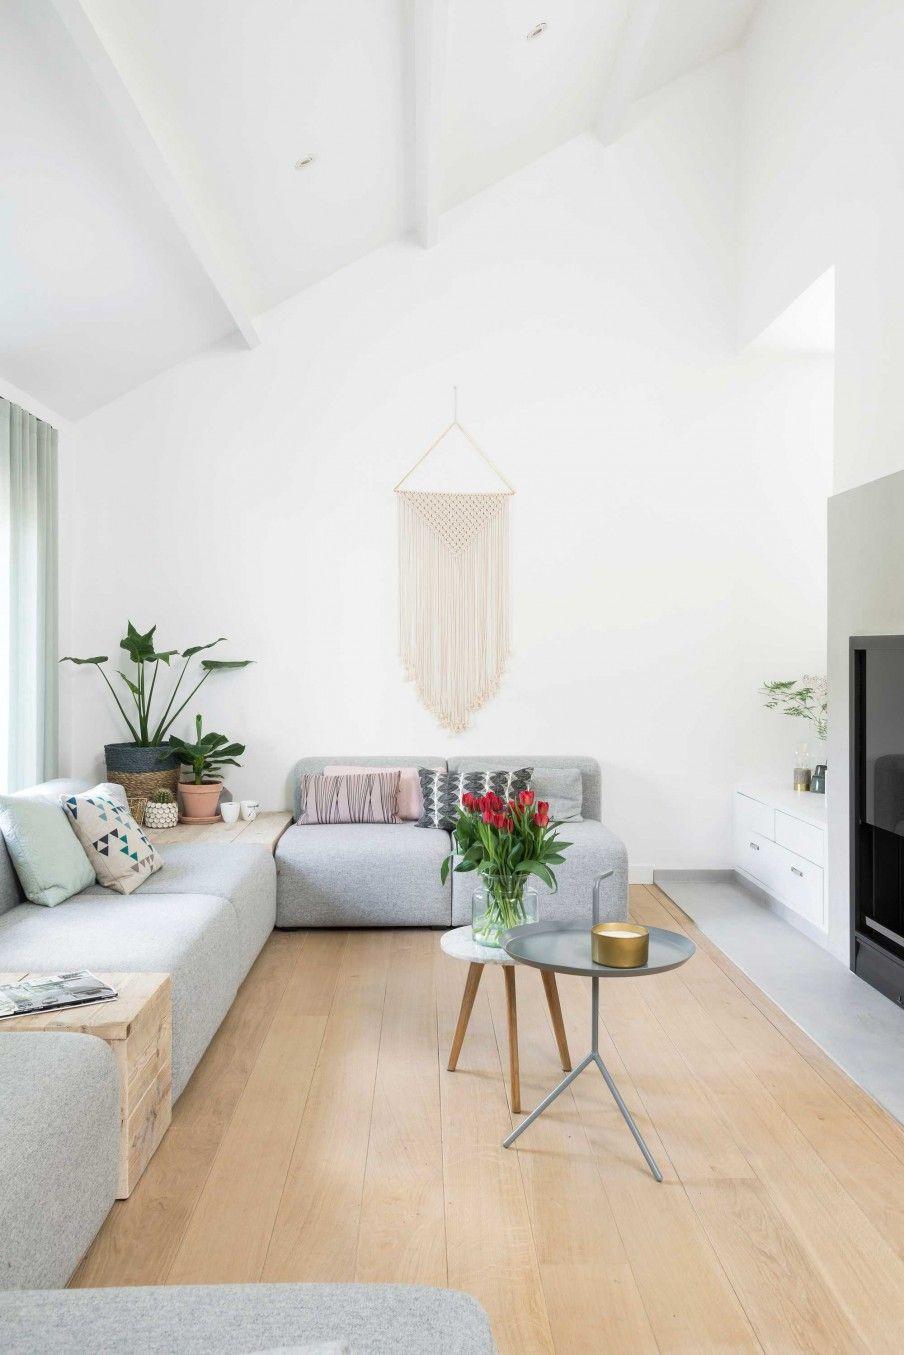 Woonkamer | living room | vtwonen 06-2017 | Fotografie & styling ...